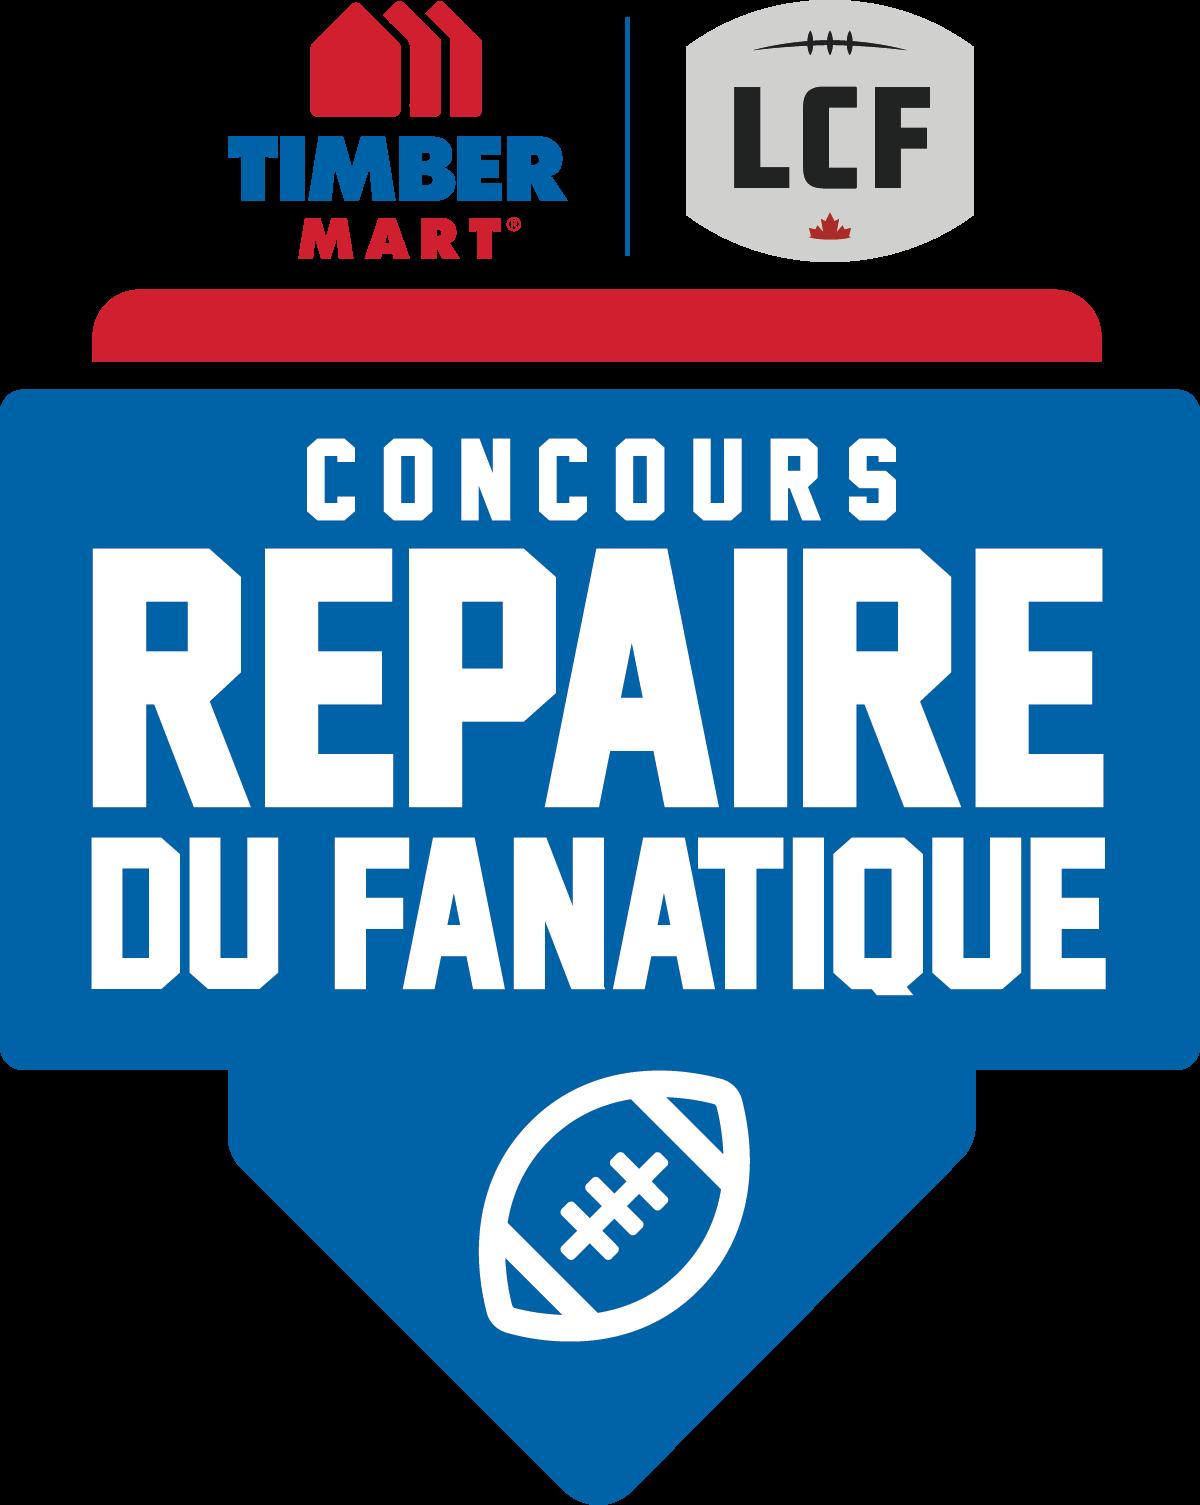 Repaire du fanatique logo